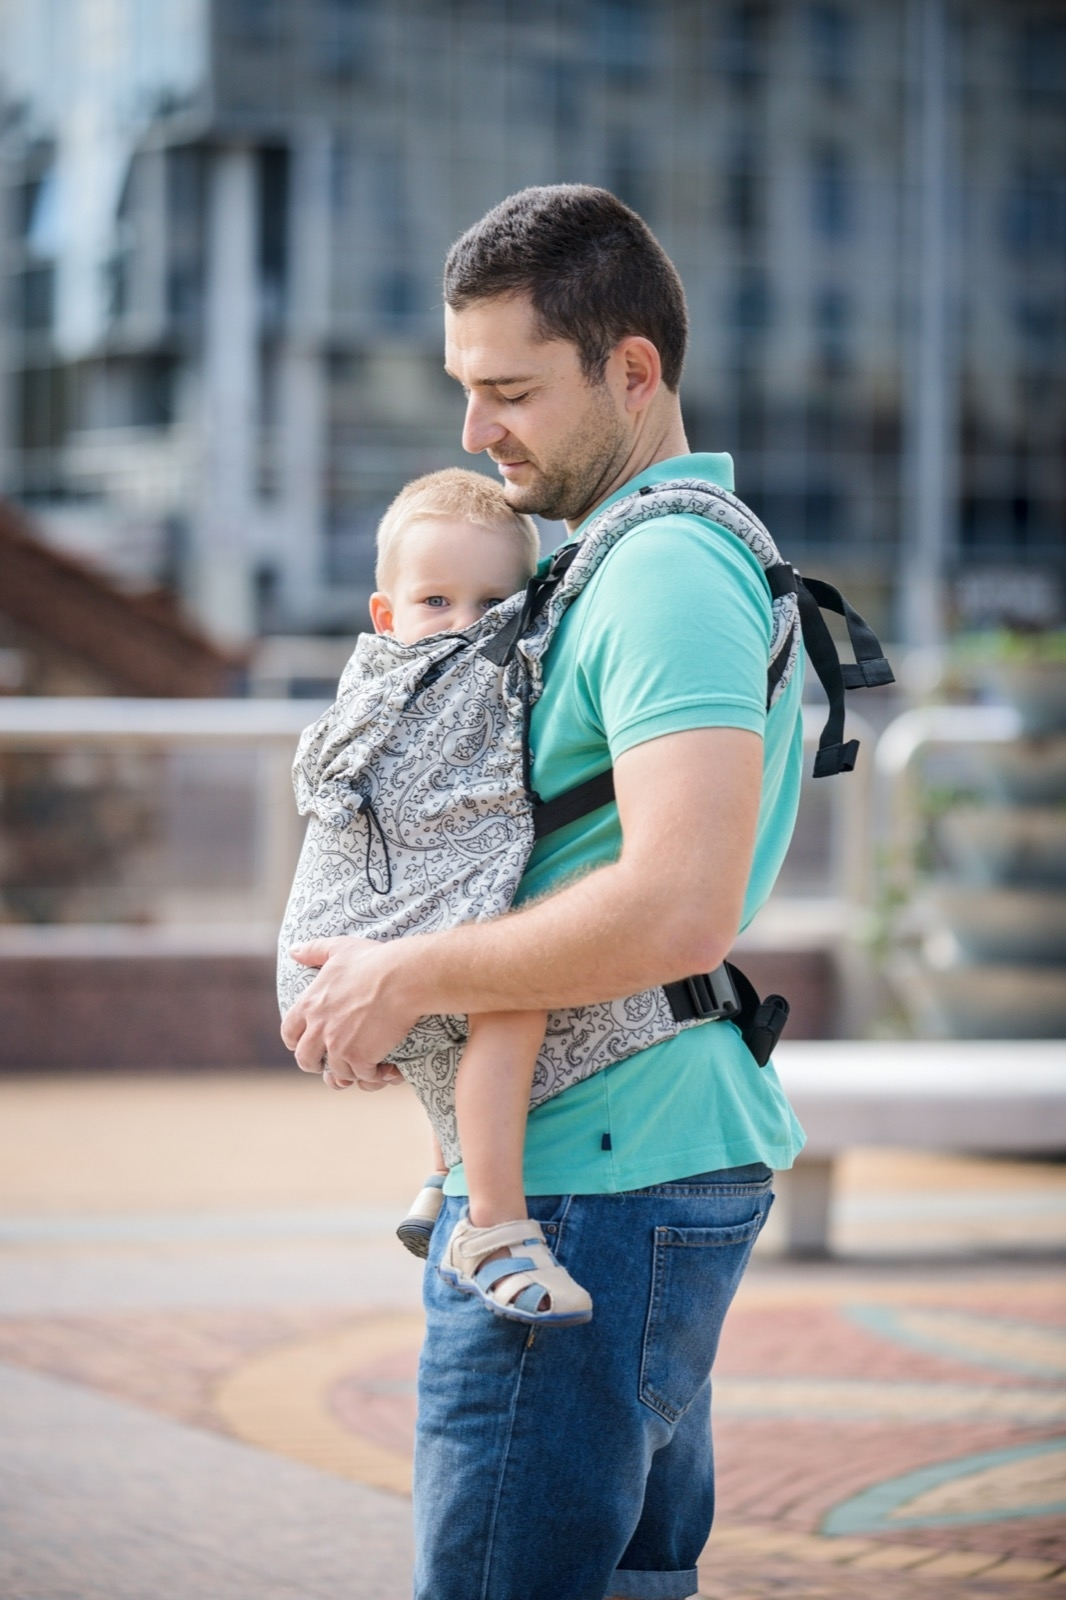 Neko Switch Toddler Size Carrier - Efes Paisley Hazel Light